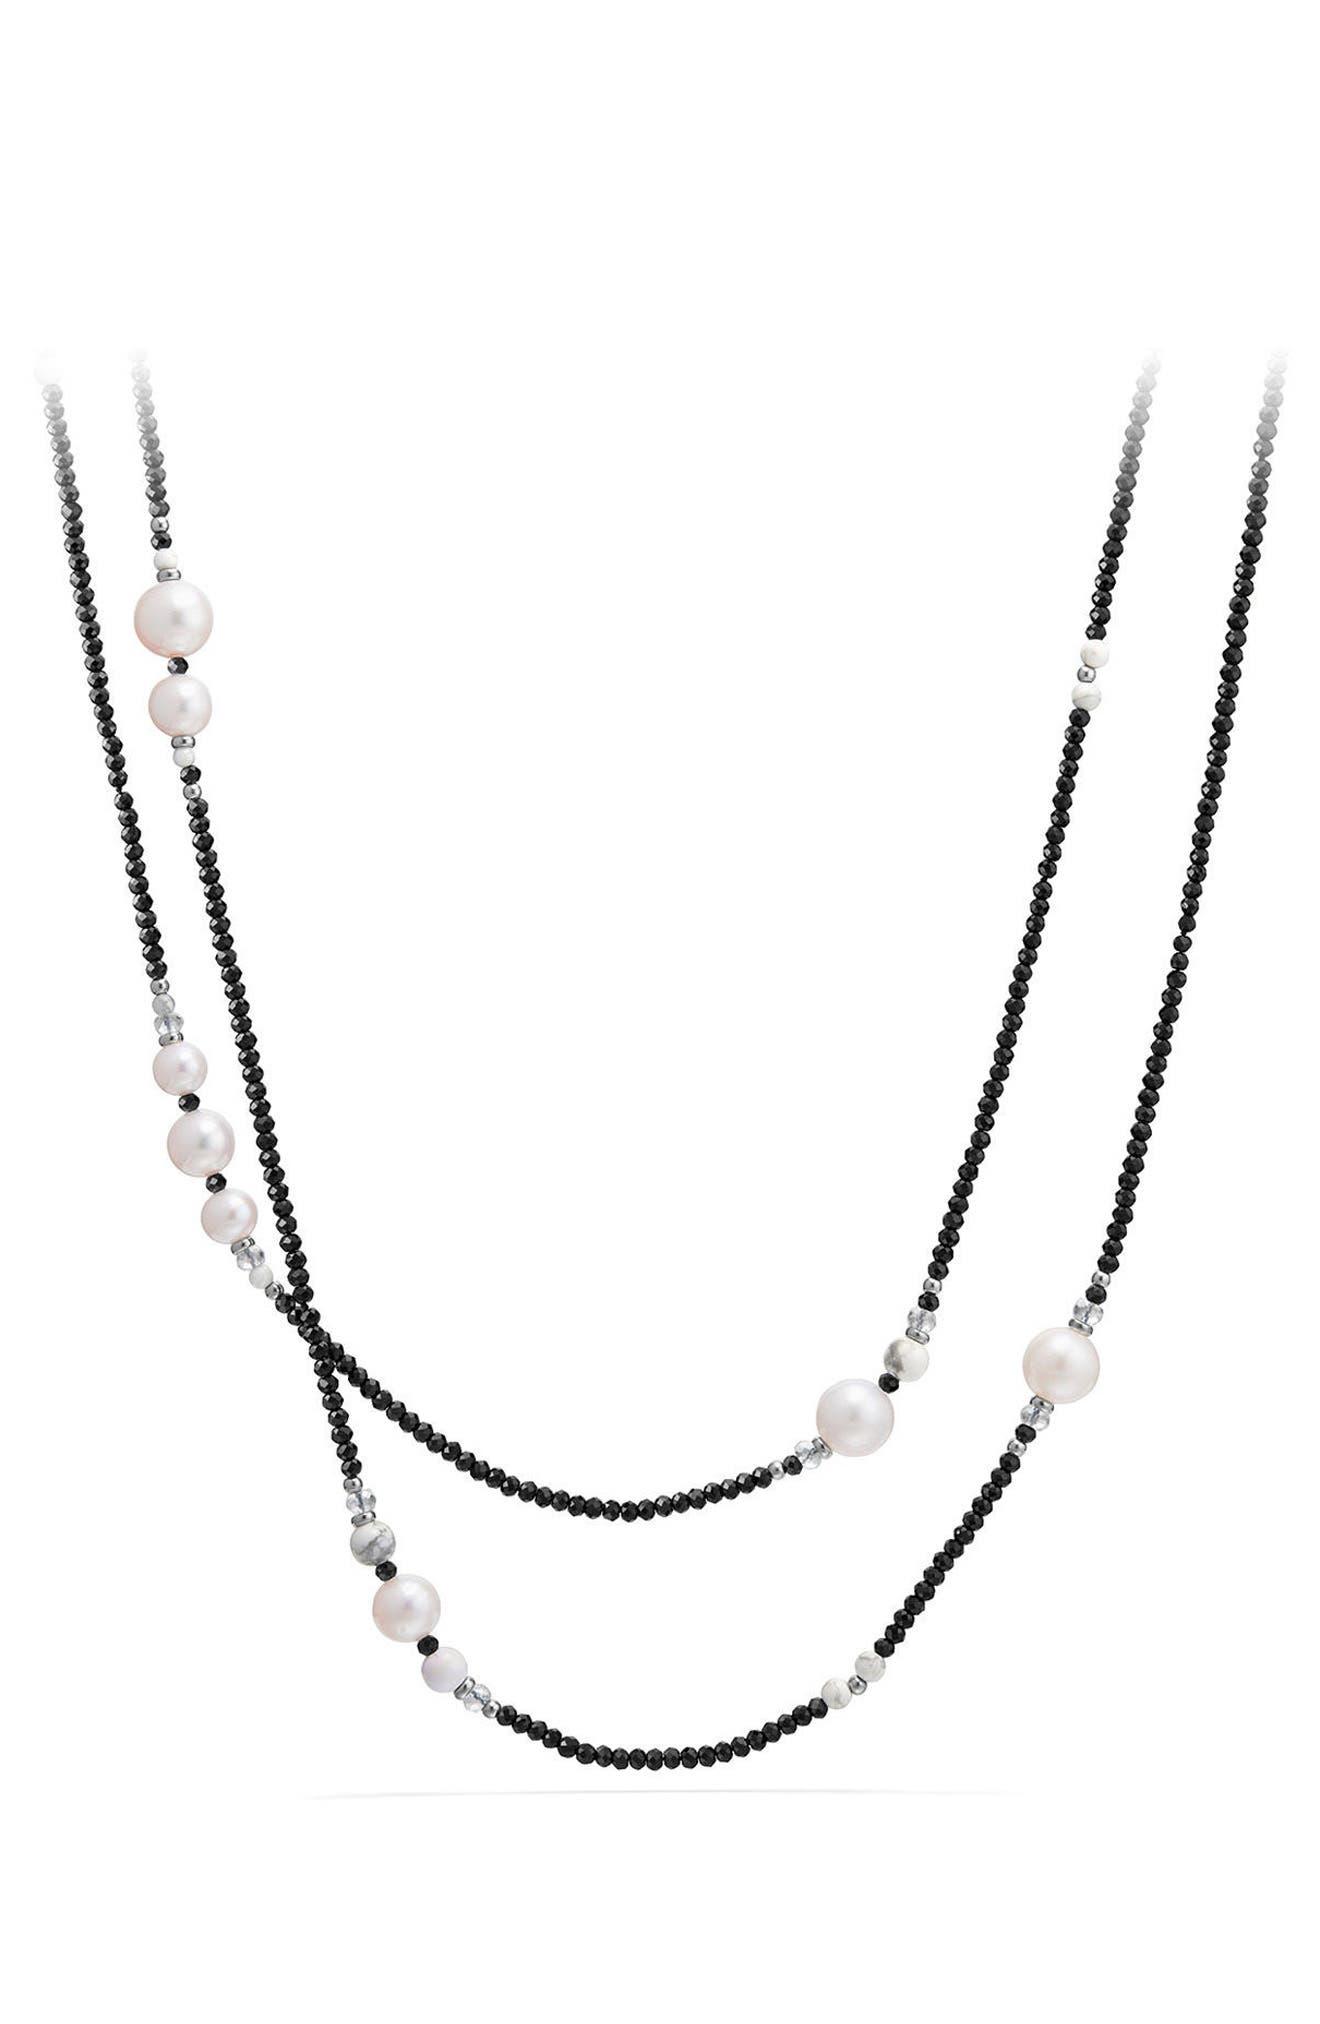 Solari - Tweejoux Pearl Necklace,                             Main thumbnail 1, color,                             Pearl/ Black Spinel